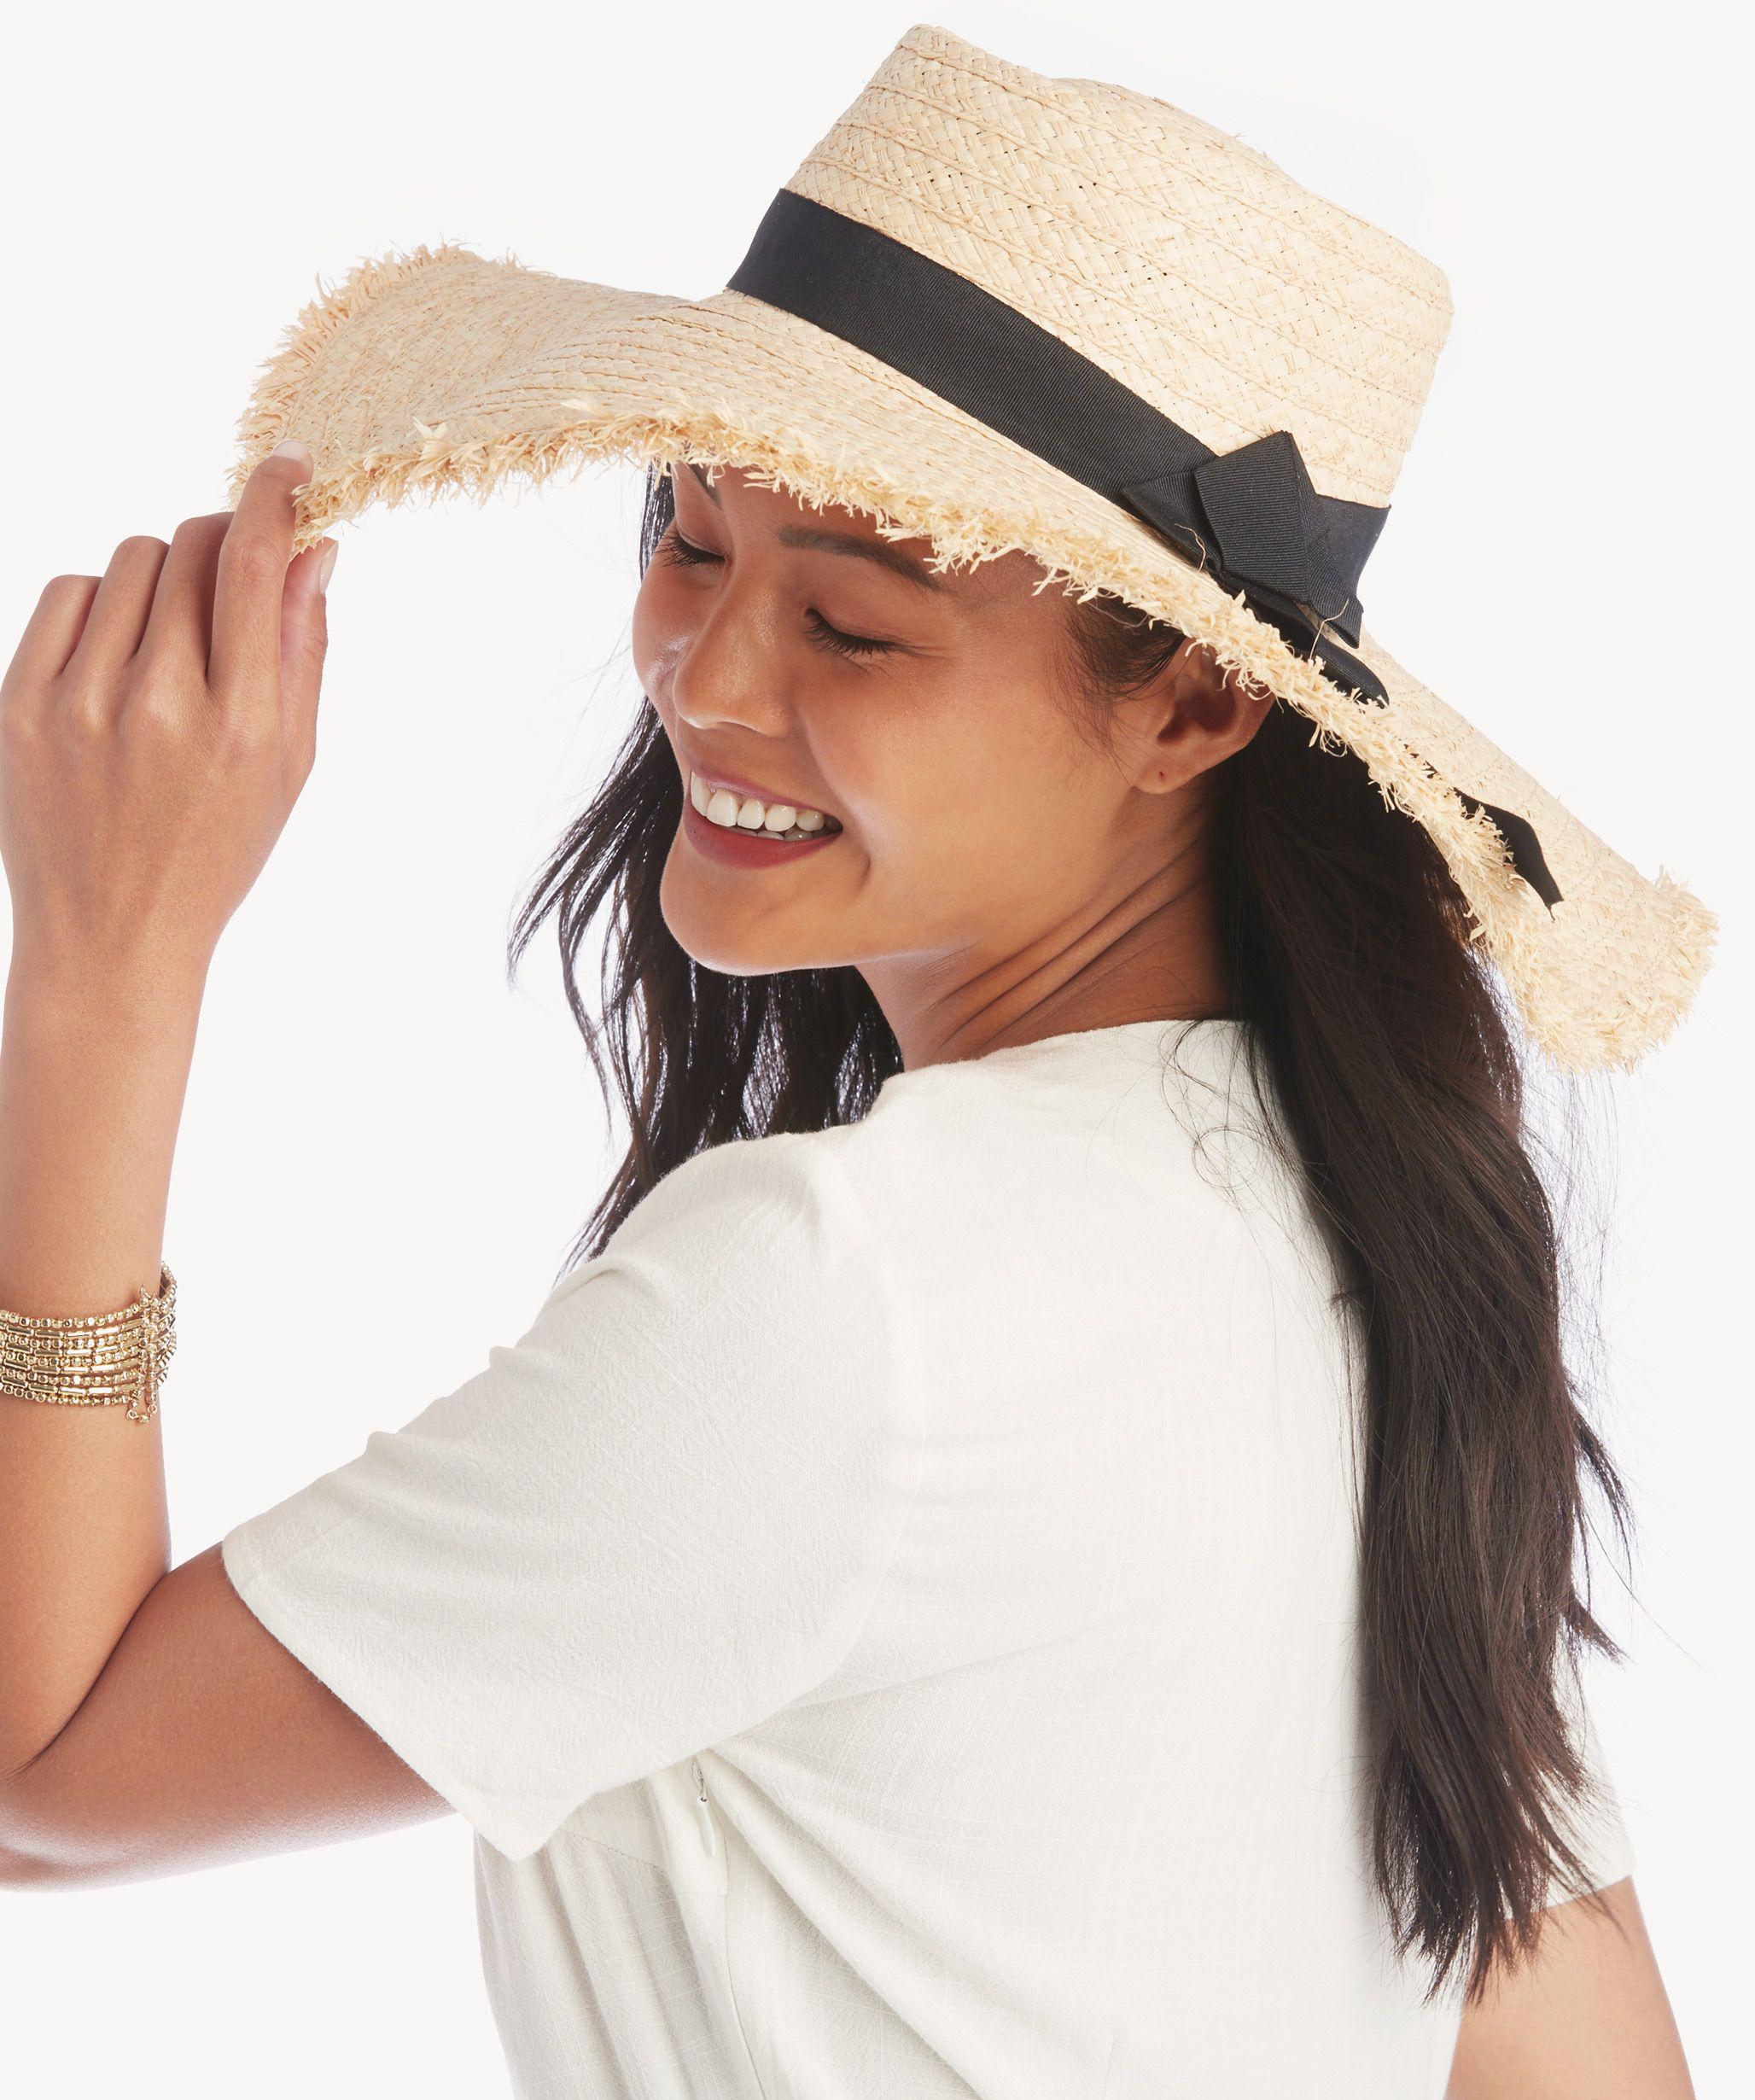 Lyst - Sole Society Textured Wide Brim Sun Hat in White 7717b18752d